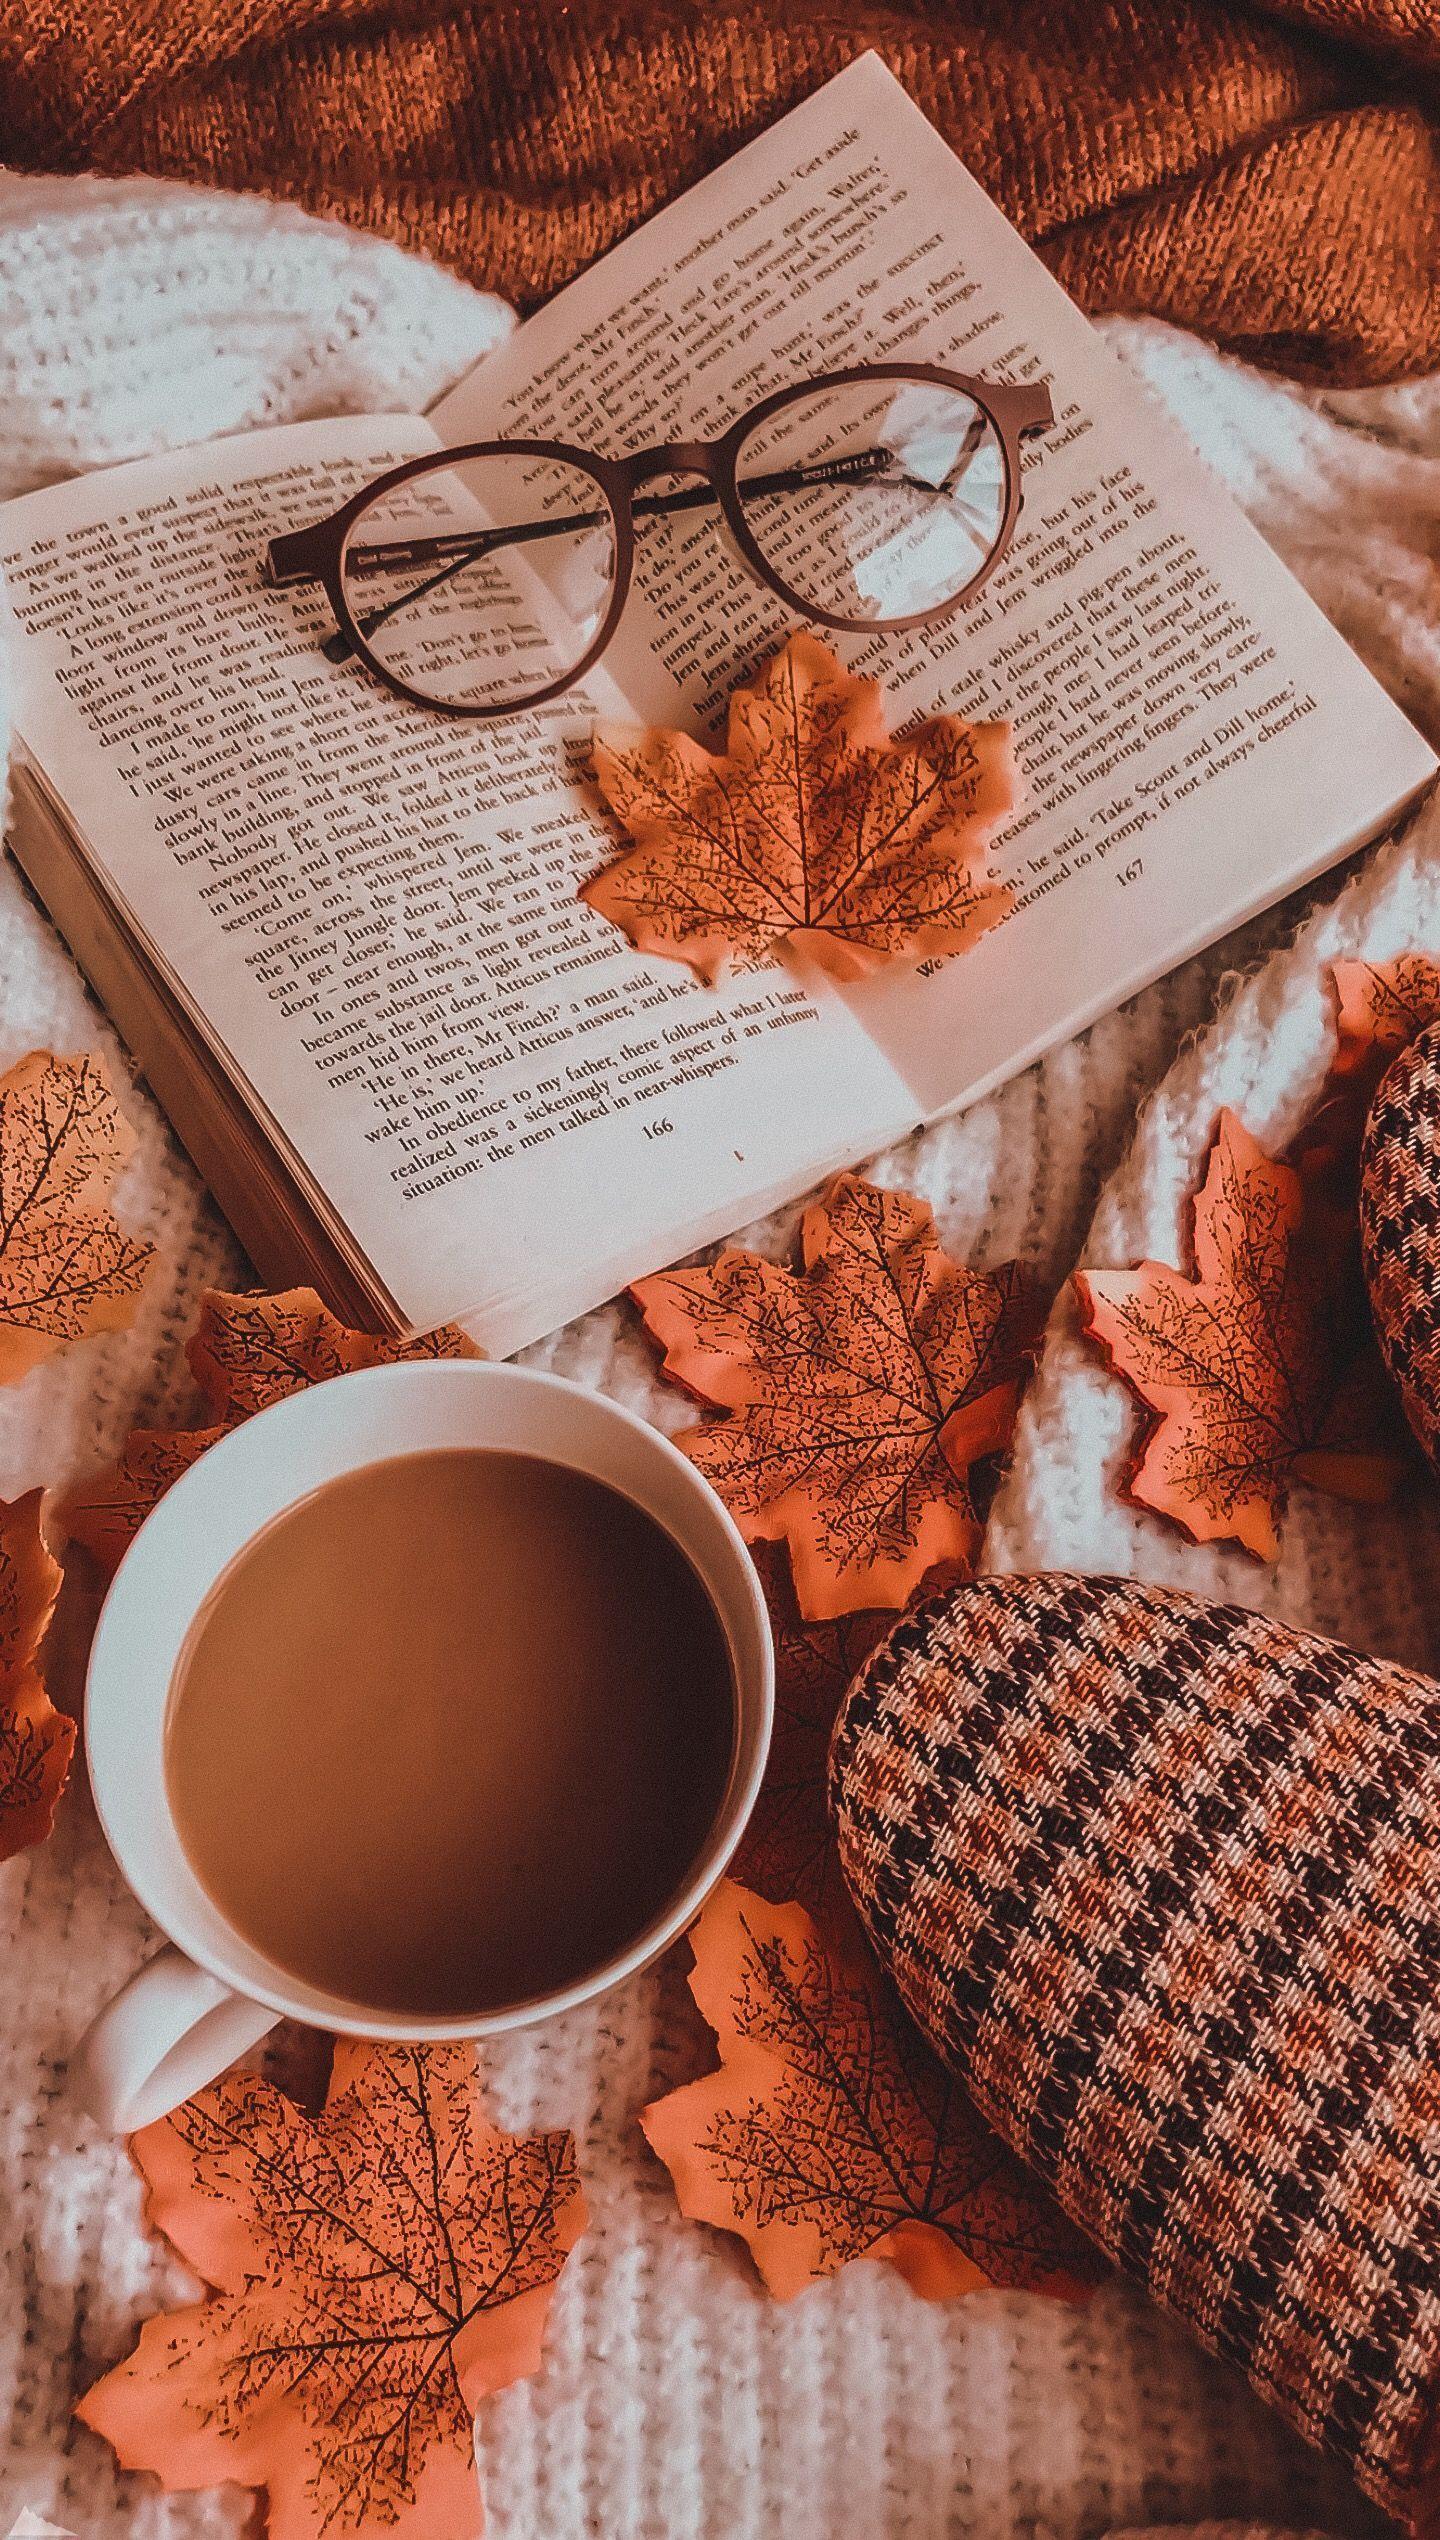 ☁︎·̩͙✧ ☁︎·̩͙✧ #autumnseason ☁︎·̩͙✧ ☁︎·̩͙✧ #autumnwallpaper